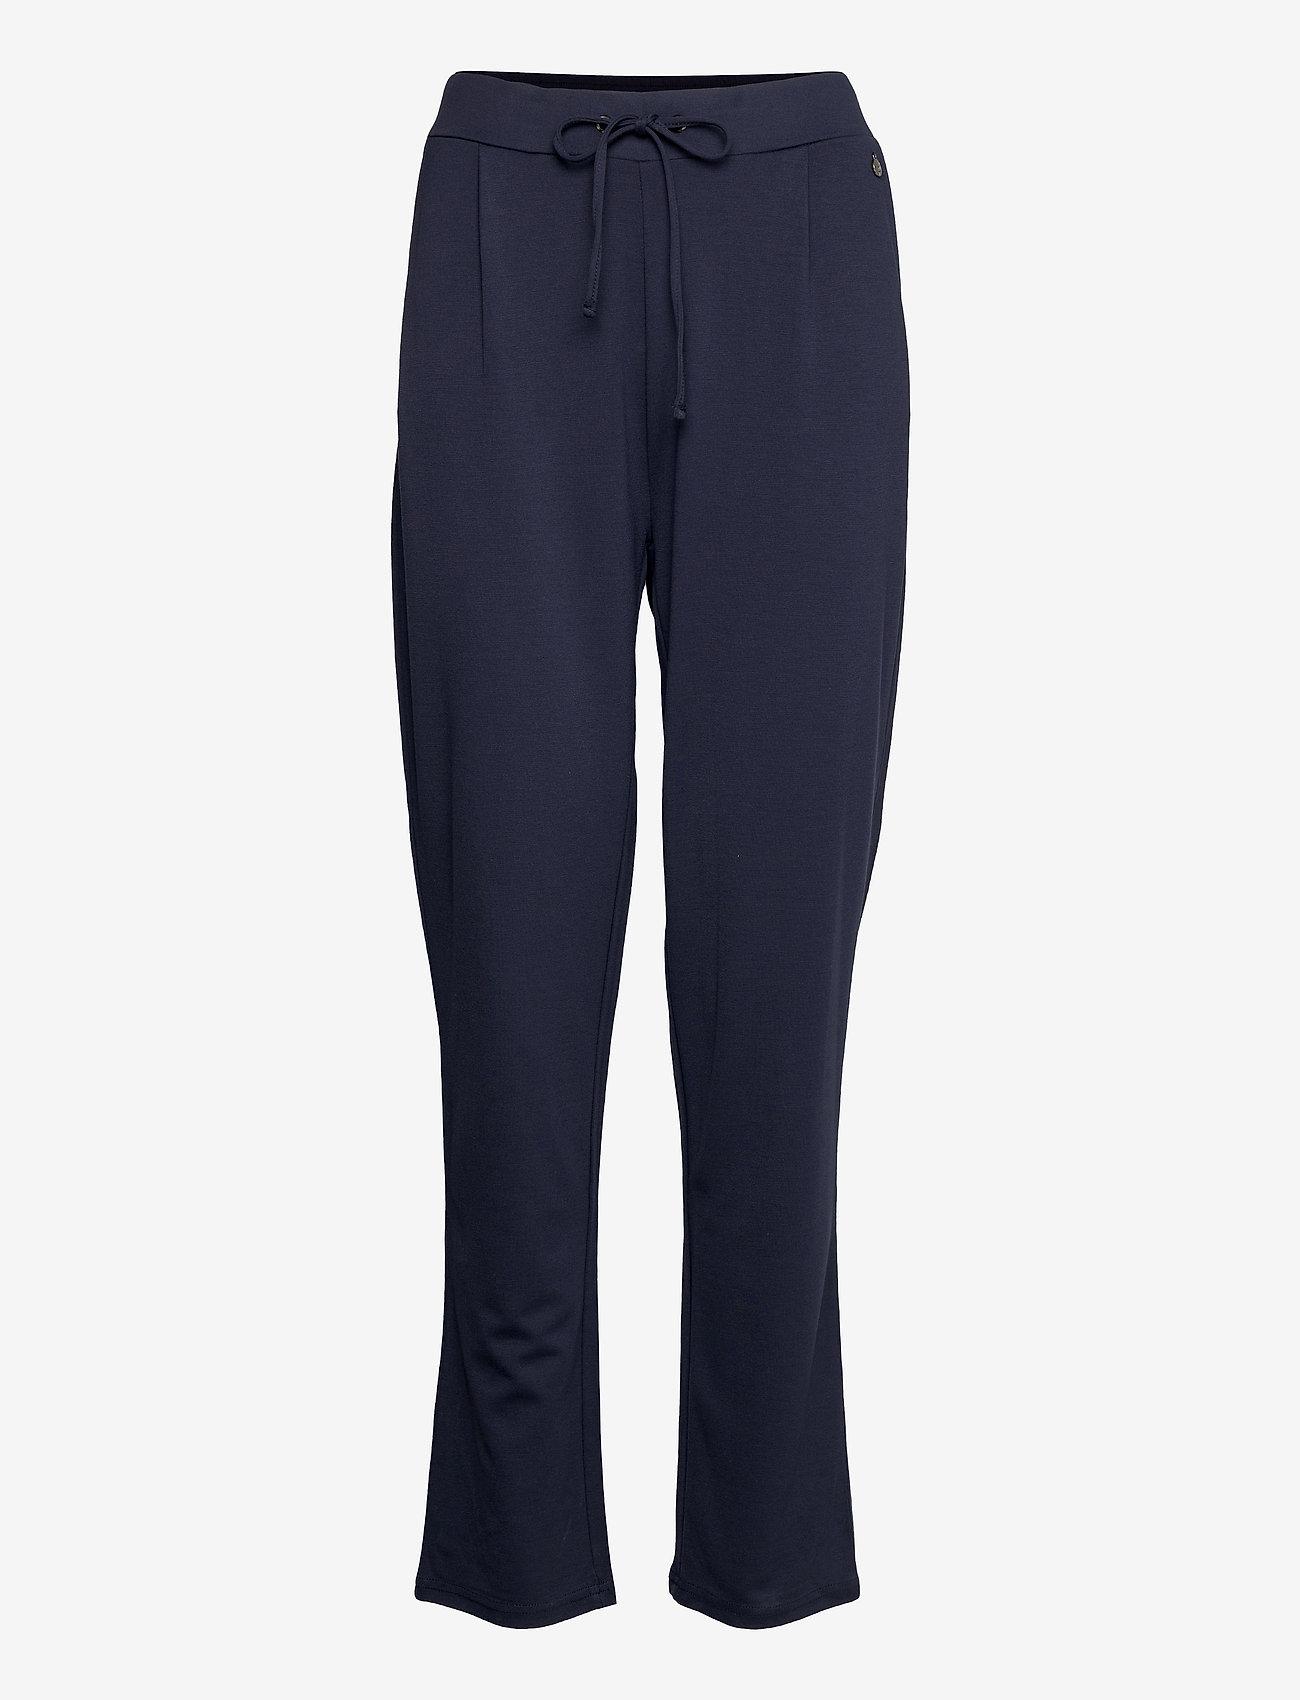 Fransa - FRZASTRETCH 1 Pants - casual broeken - navy blazer - 0